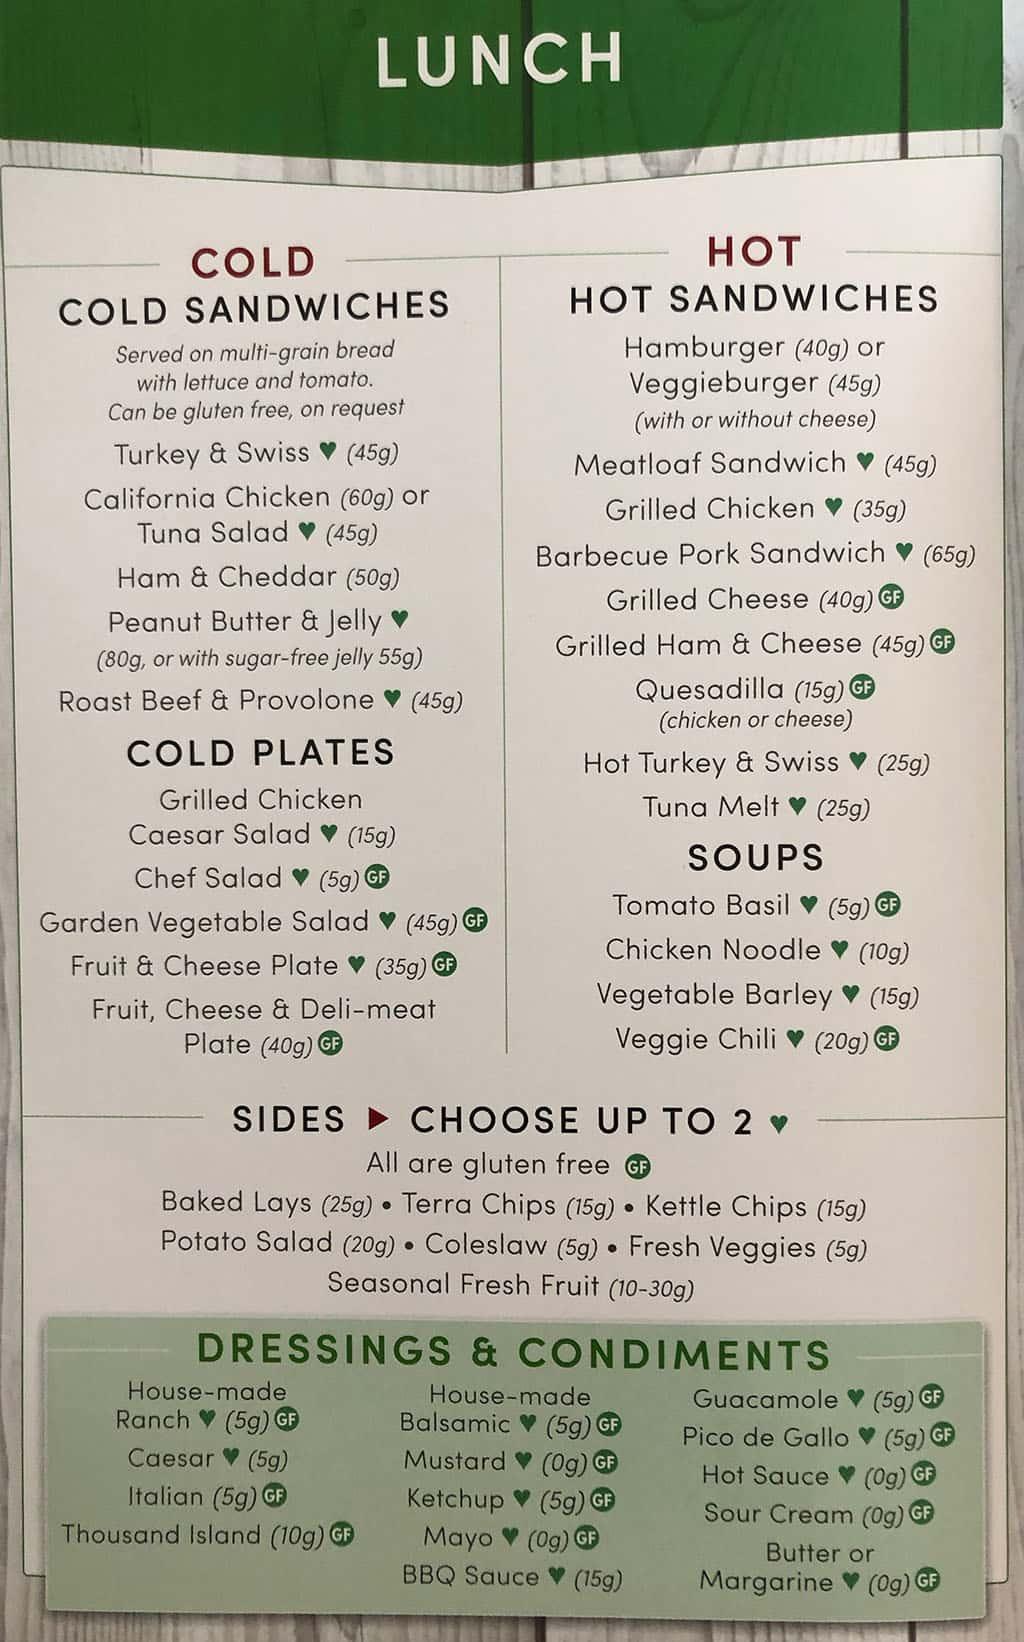 University Of Utah Hospital In Patient menu - lunch